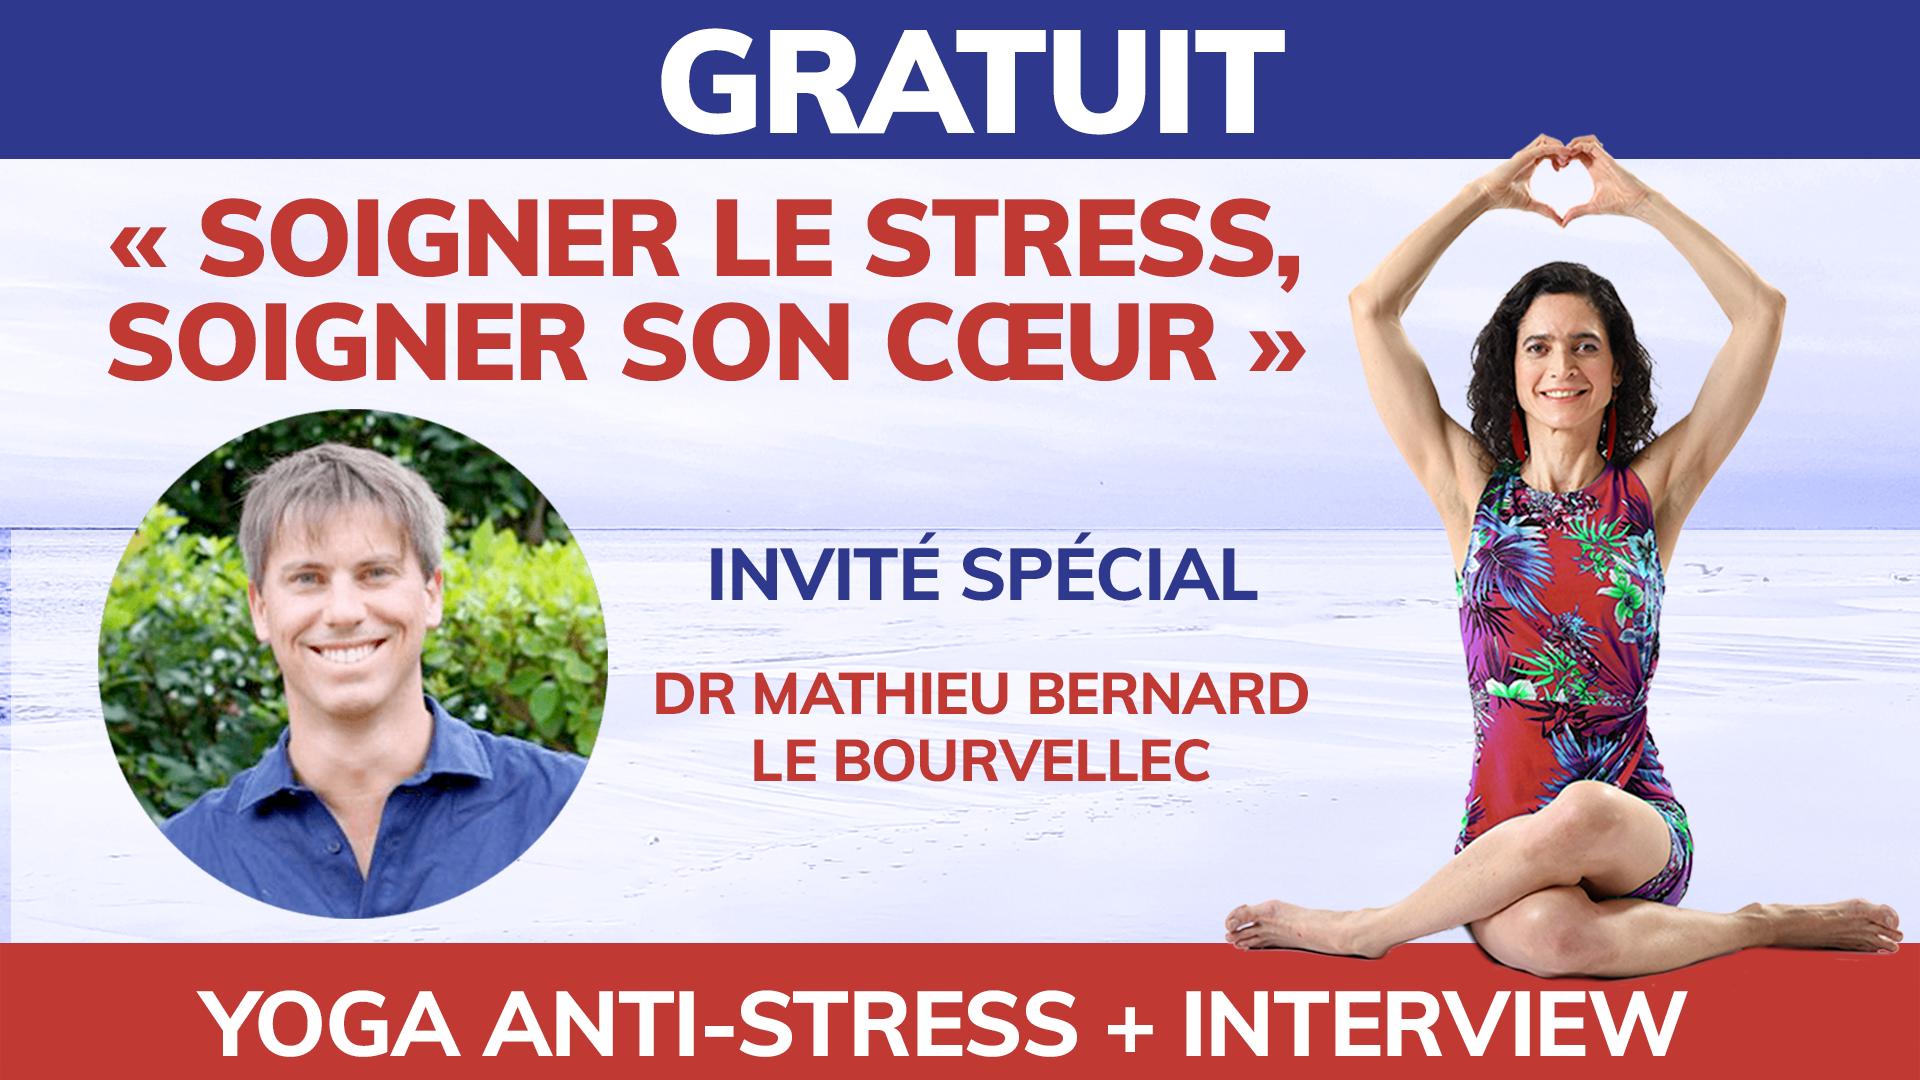 Carolina de la Cuesta interview le Dr Mathieu Bernard-Le Bourvellec sur Happyculture.tv